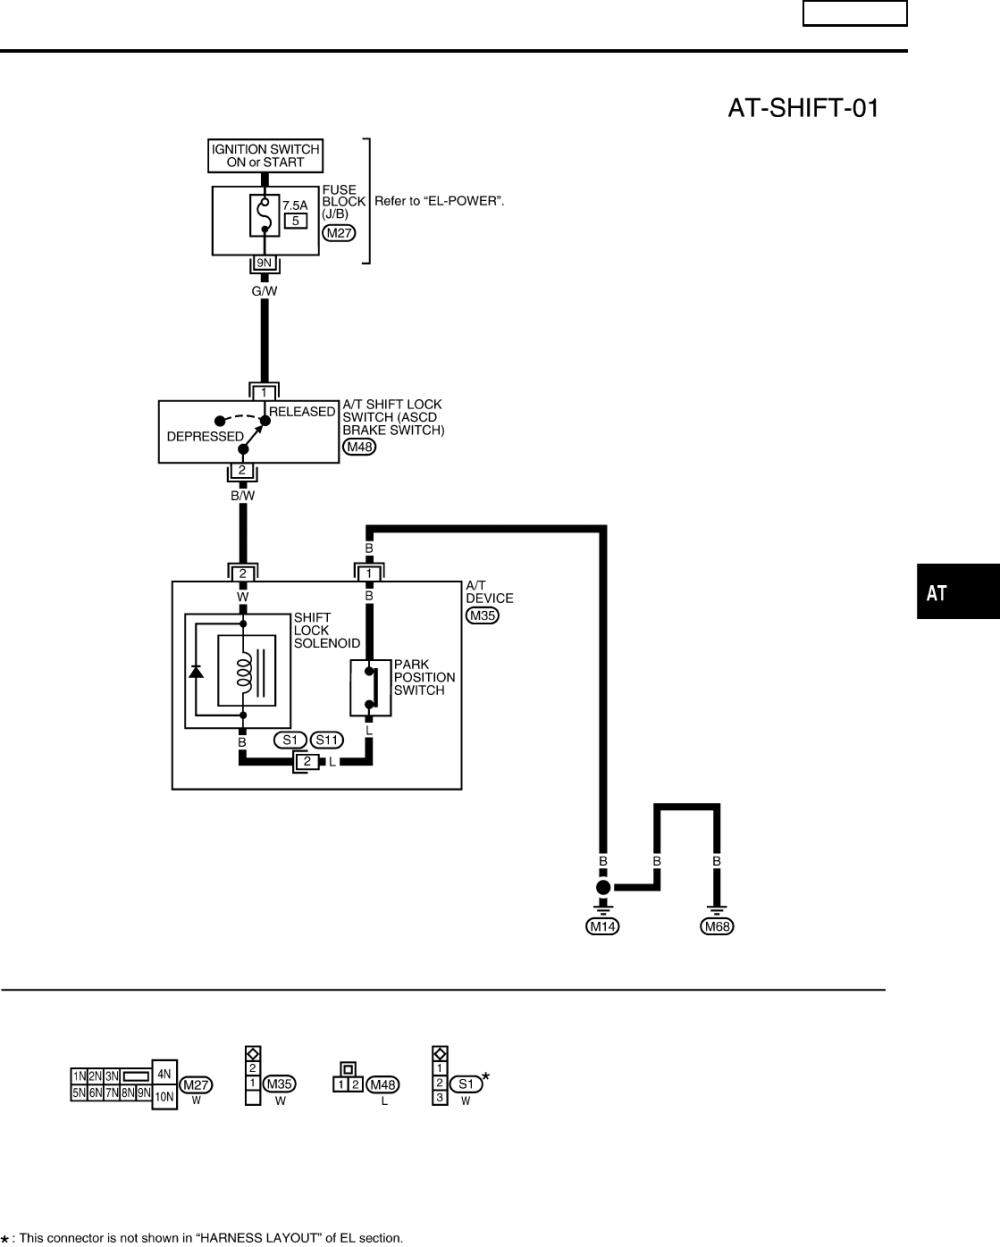 medium resolution of product detail manual at rh usermanual wiki 3 way switch wiring diagram hvac wiring diagrams